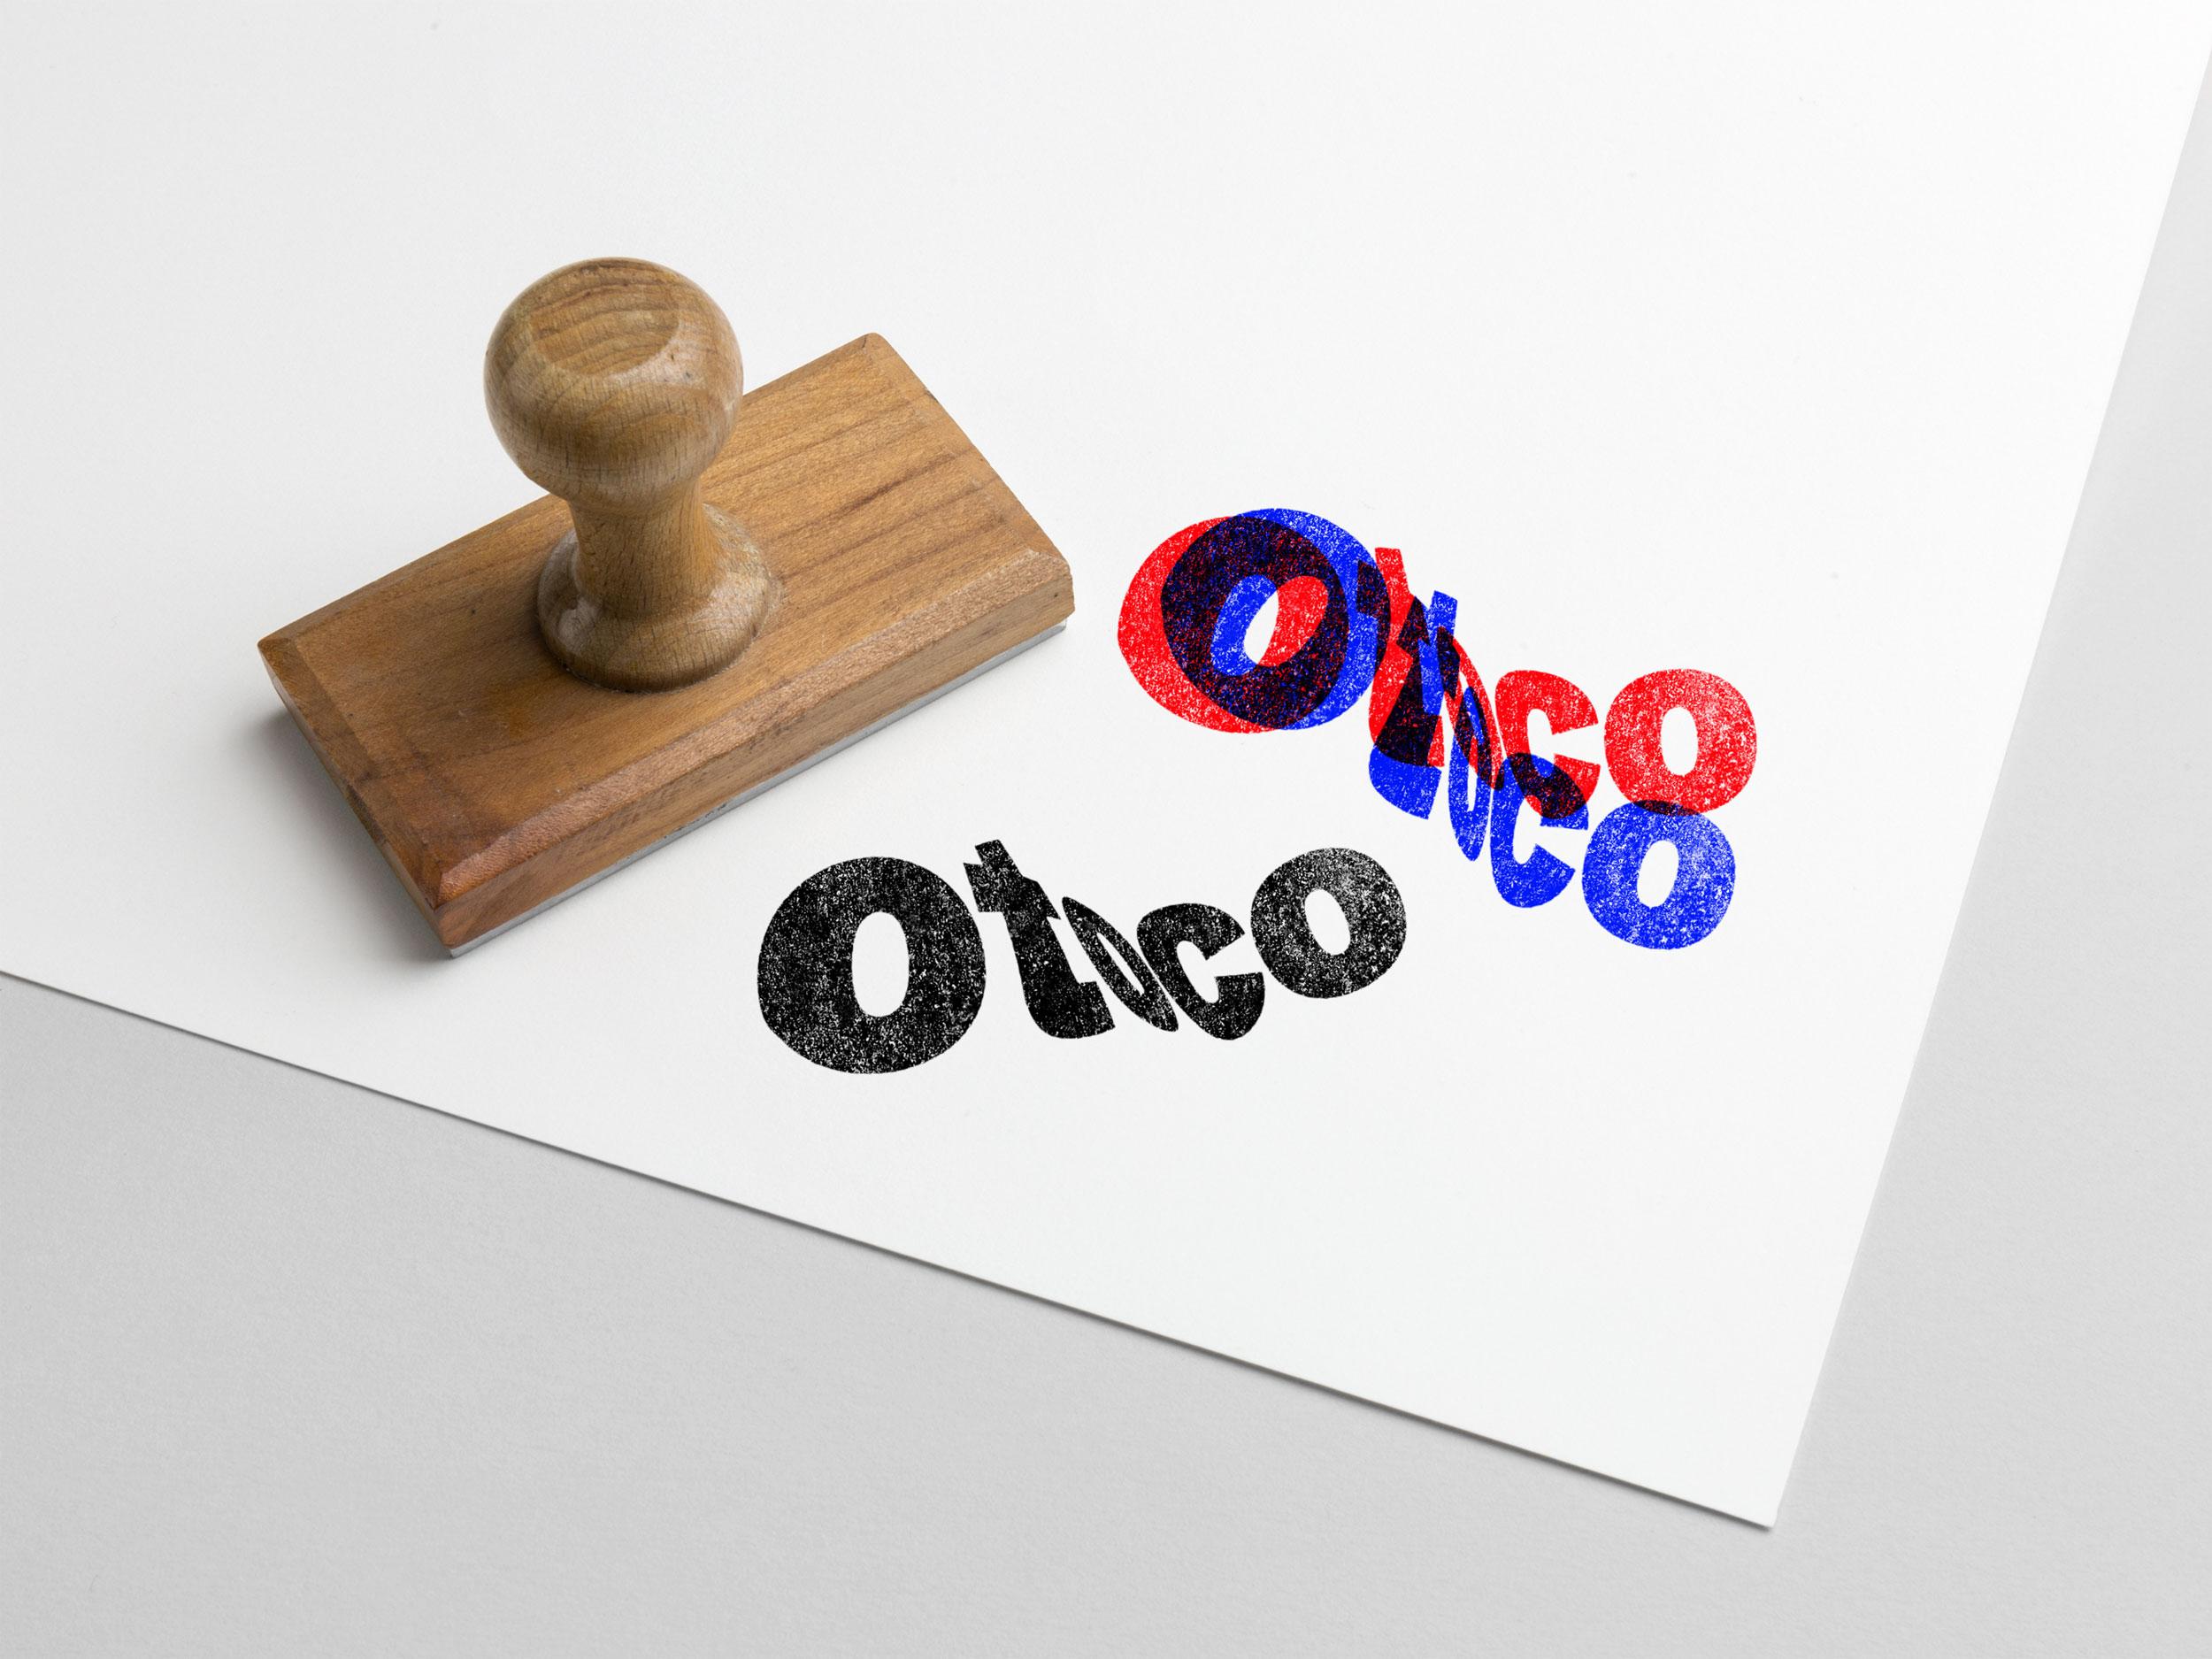 vlevle-otoco-Stamps.jpg